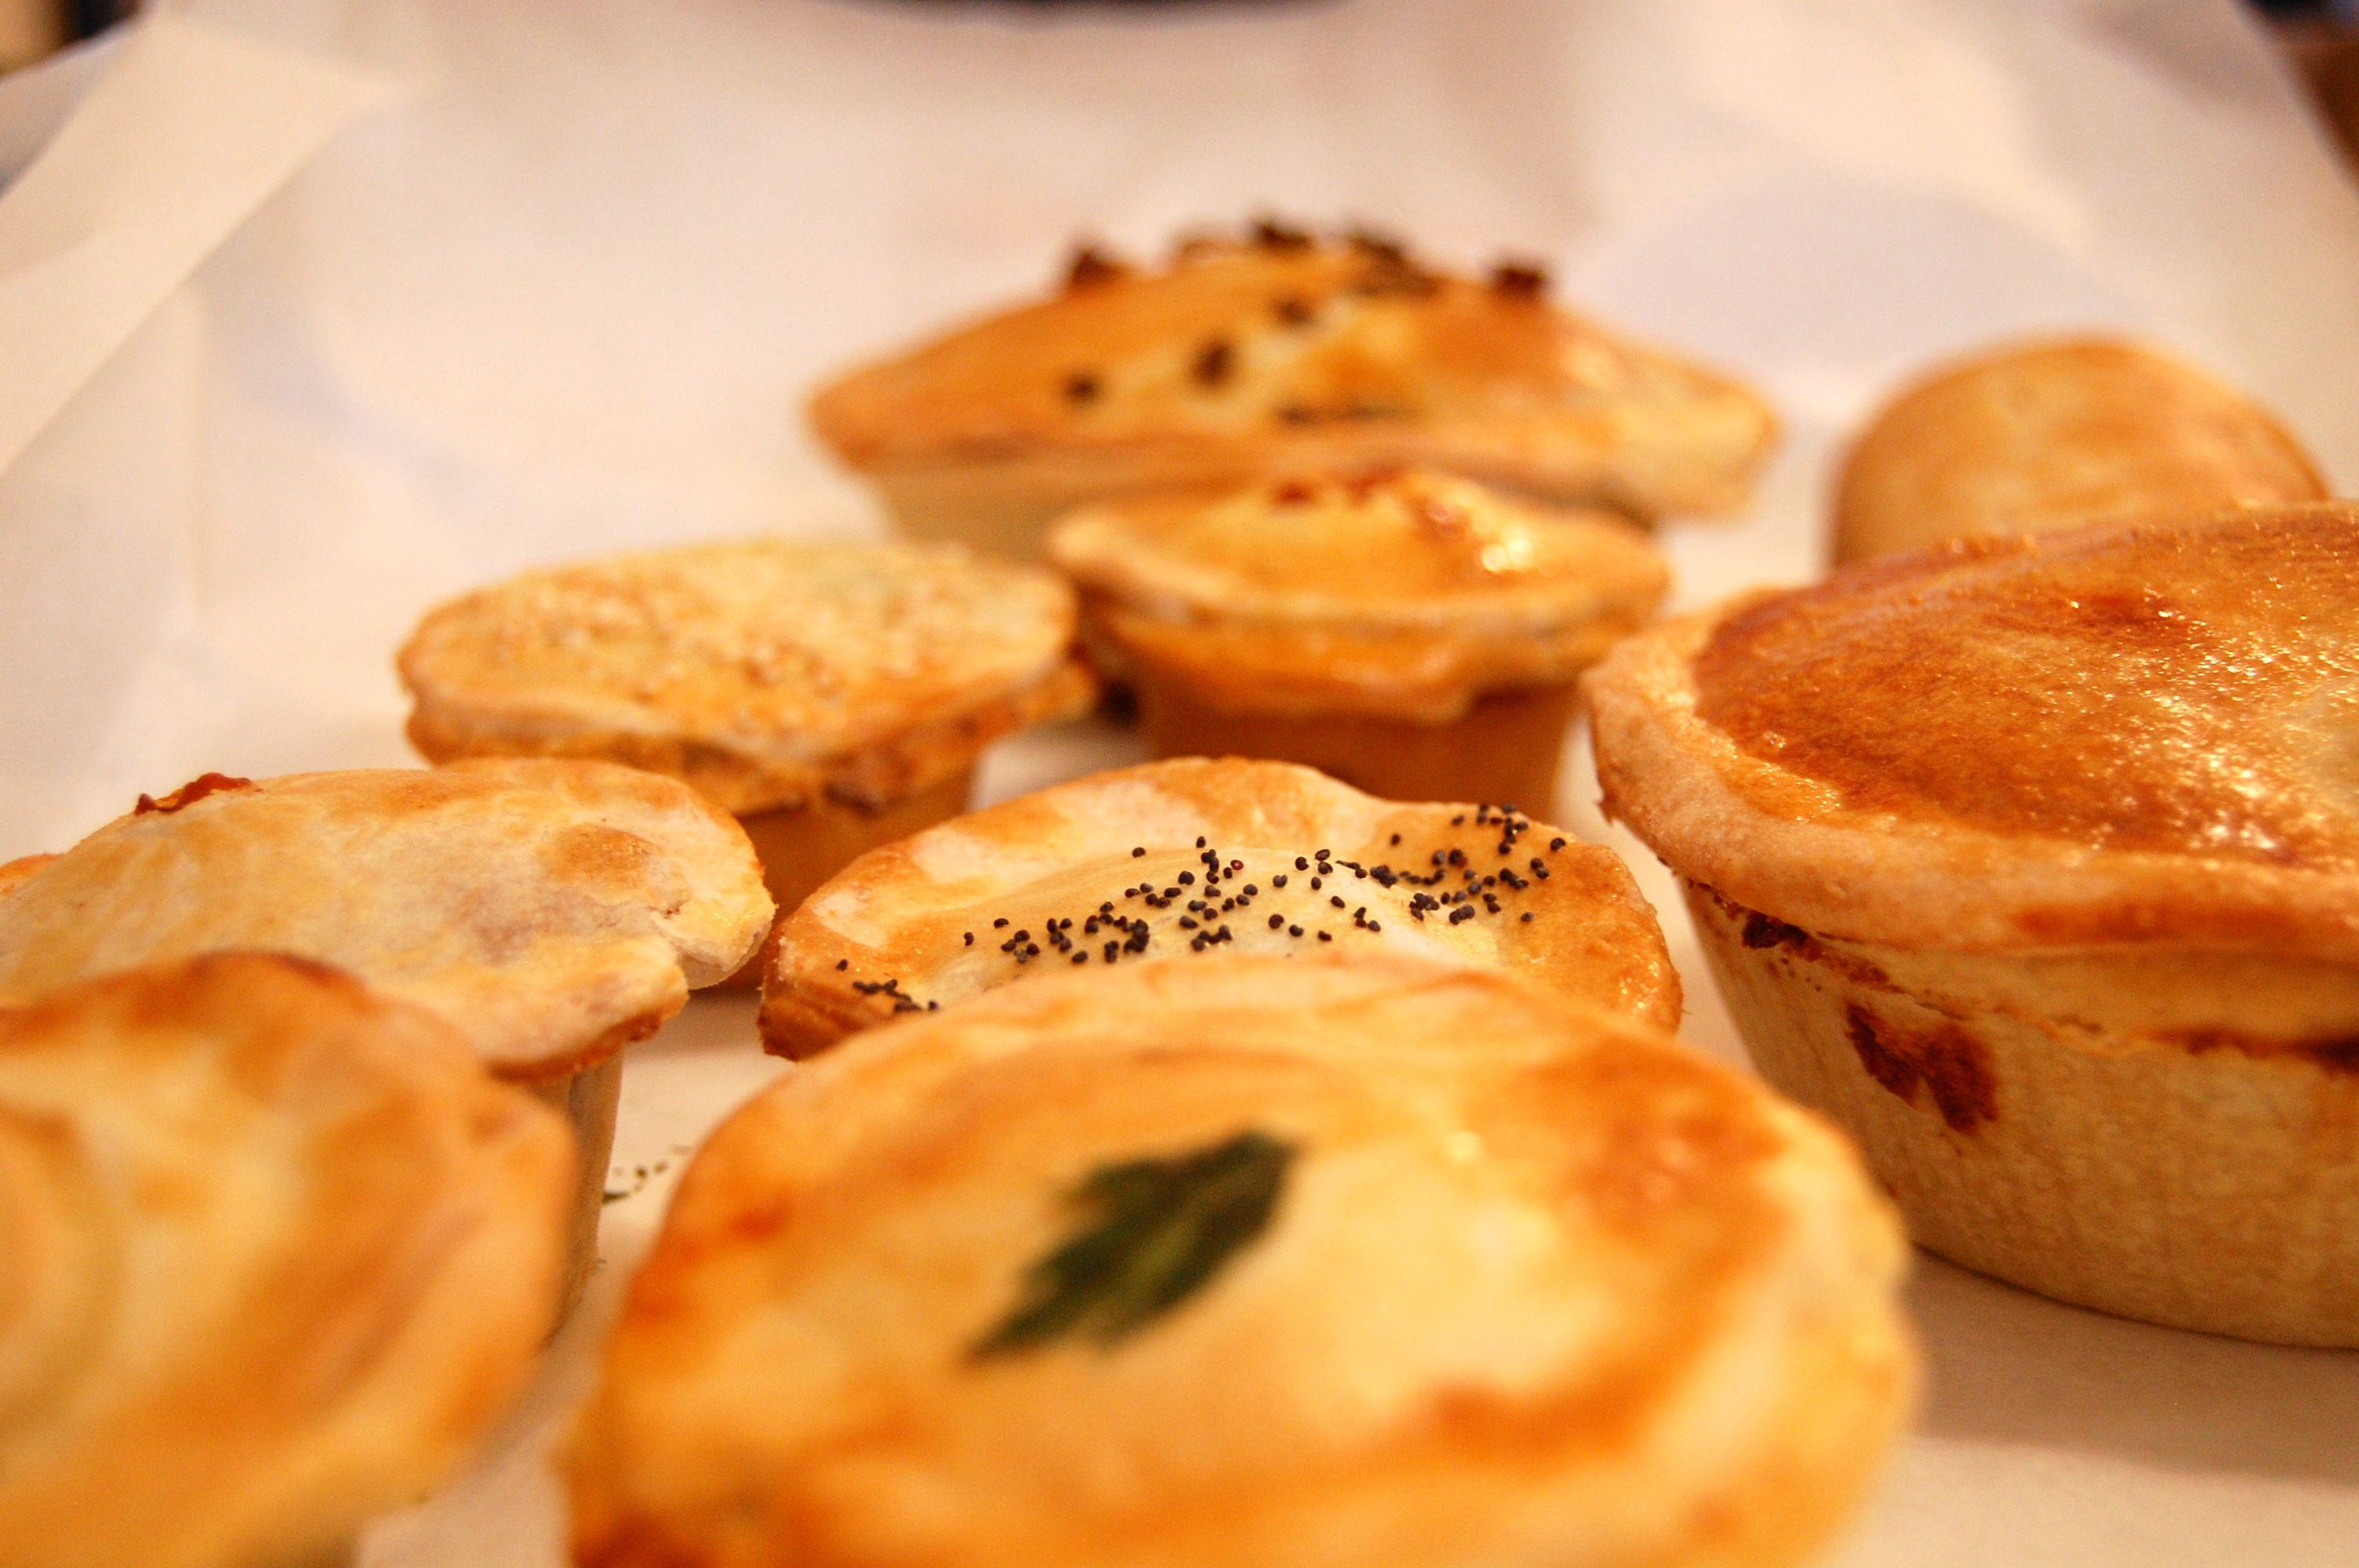 Mini Aussie Pies From Tuck Nyc Etizers Bitesize Snacks Party